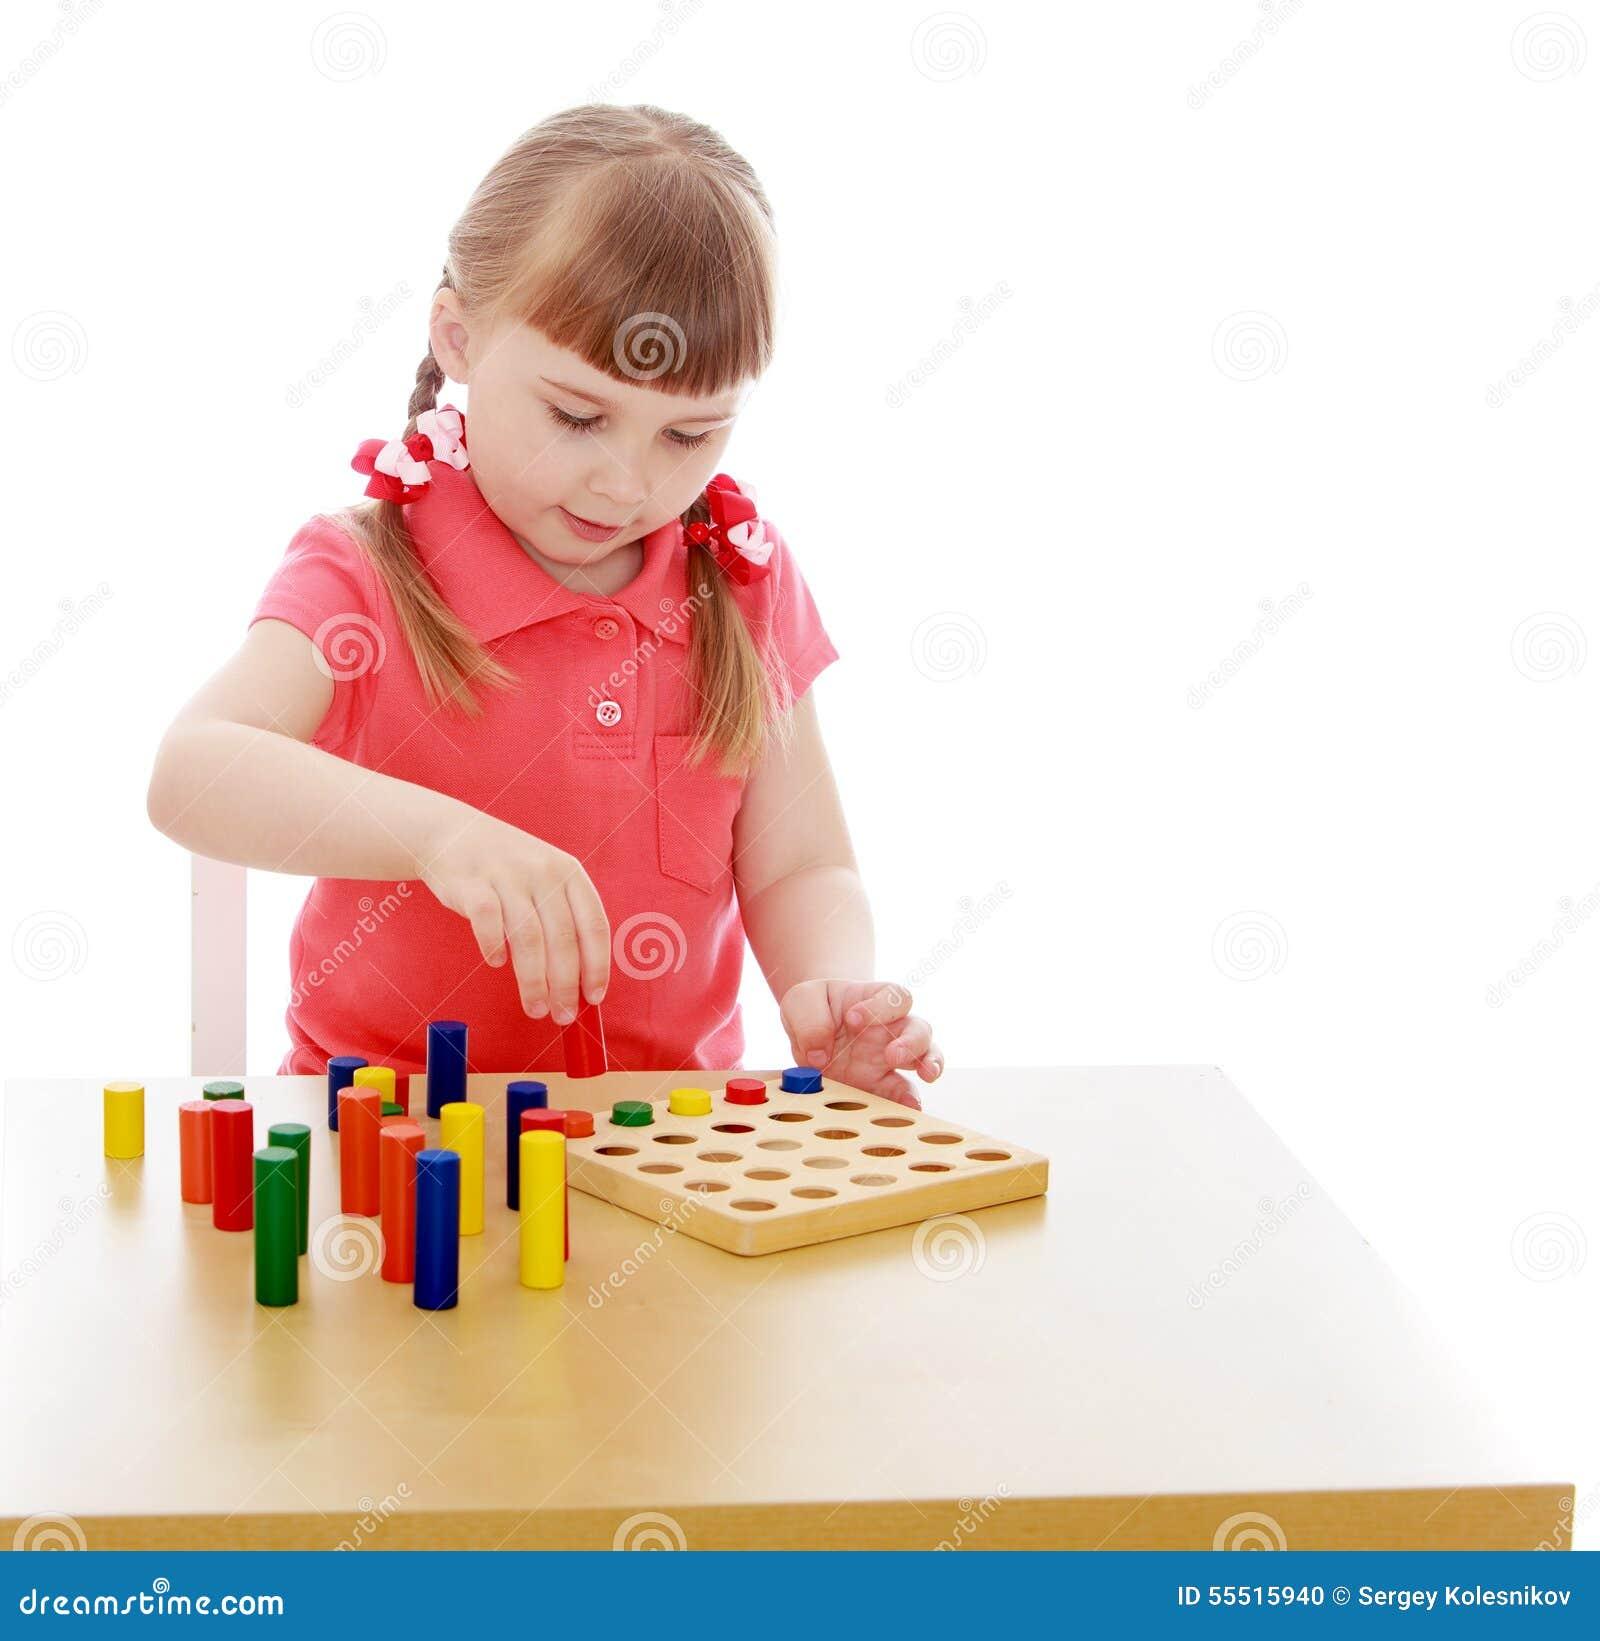 960b58d56975 Πολύ έξυπνο κορίτσι ξανθό στο παιχνίδι παιδικών σταθμών Montessori στα  υλικά Montessori που κάθονται πίνακας-απομονωμένη στο άσπρο υπόβαθρο